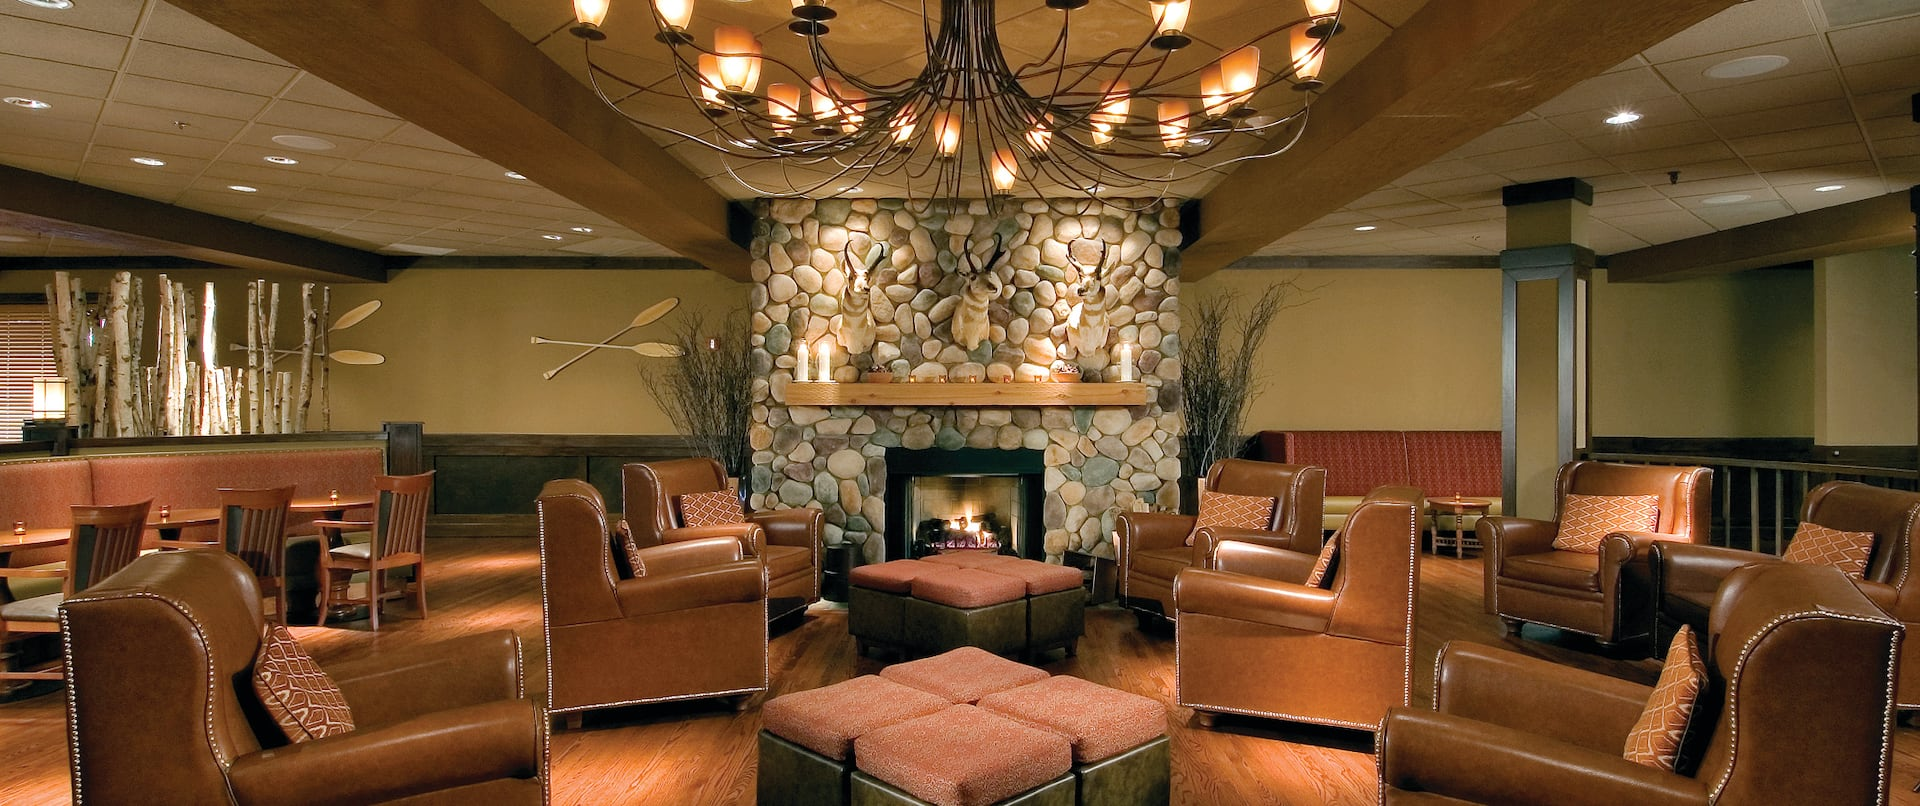 Birch River Grill Lounge